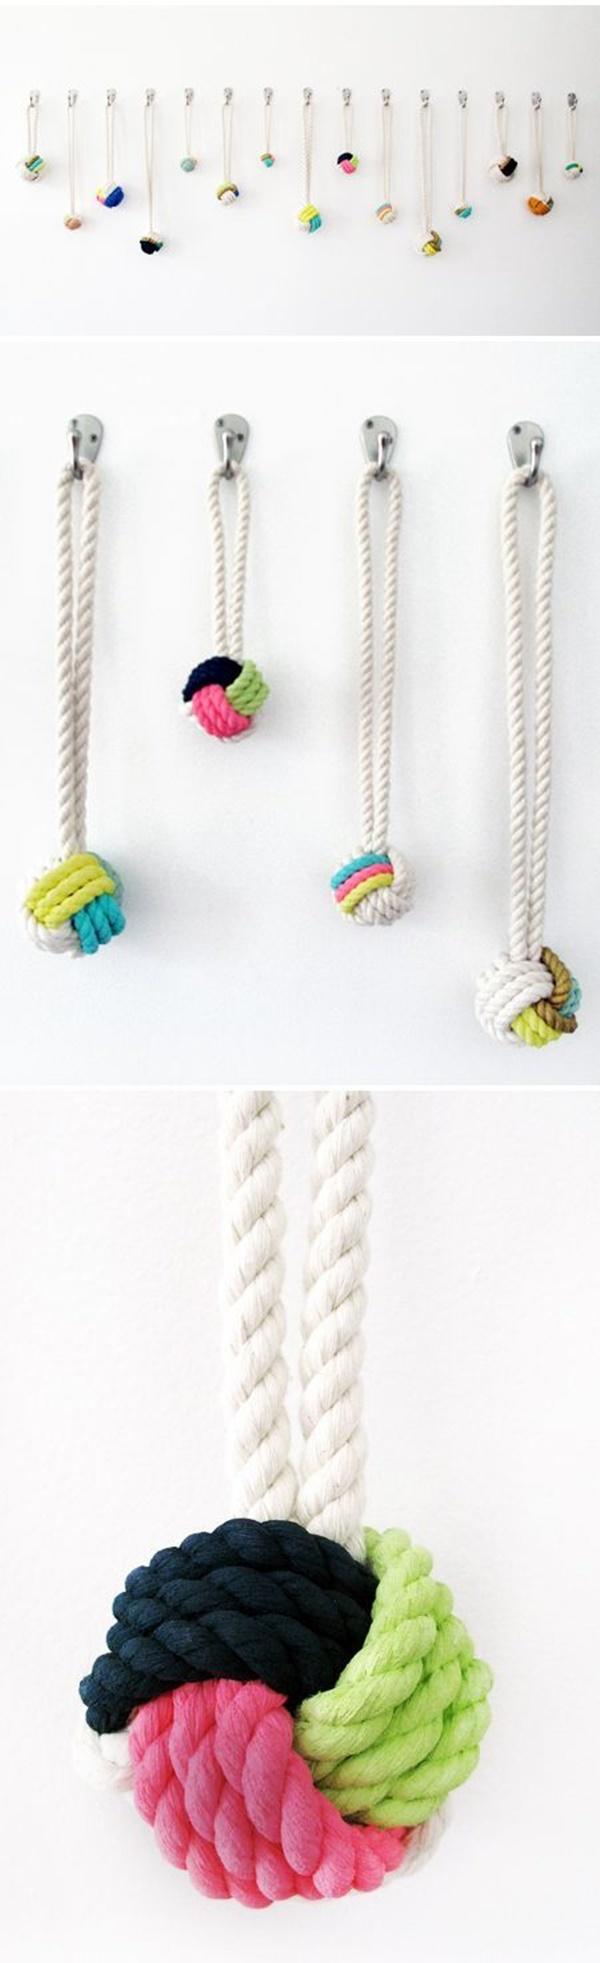 Handmade Jewelry Designs15